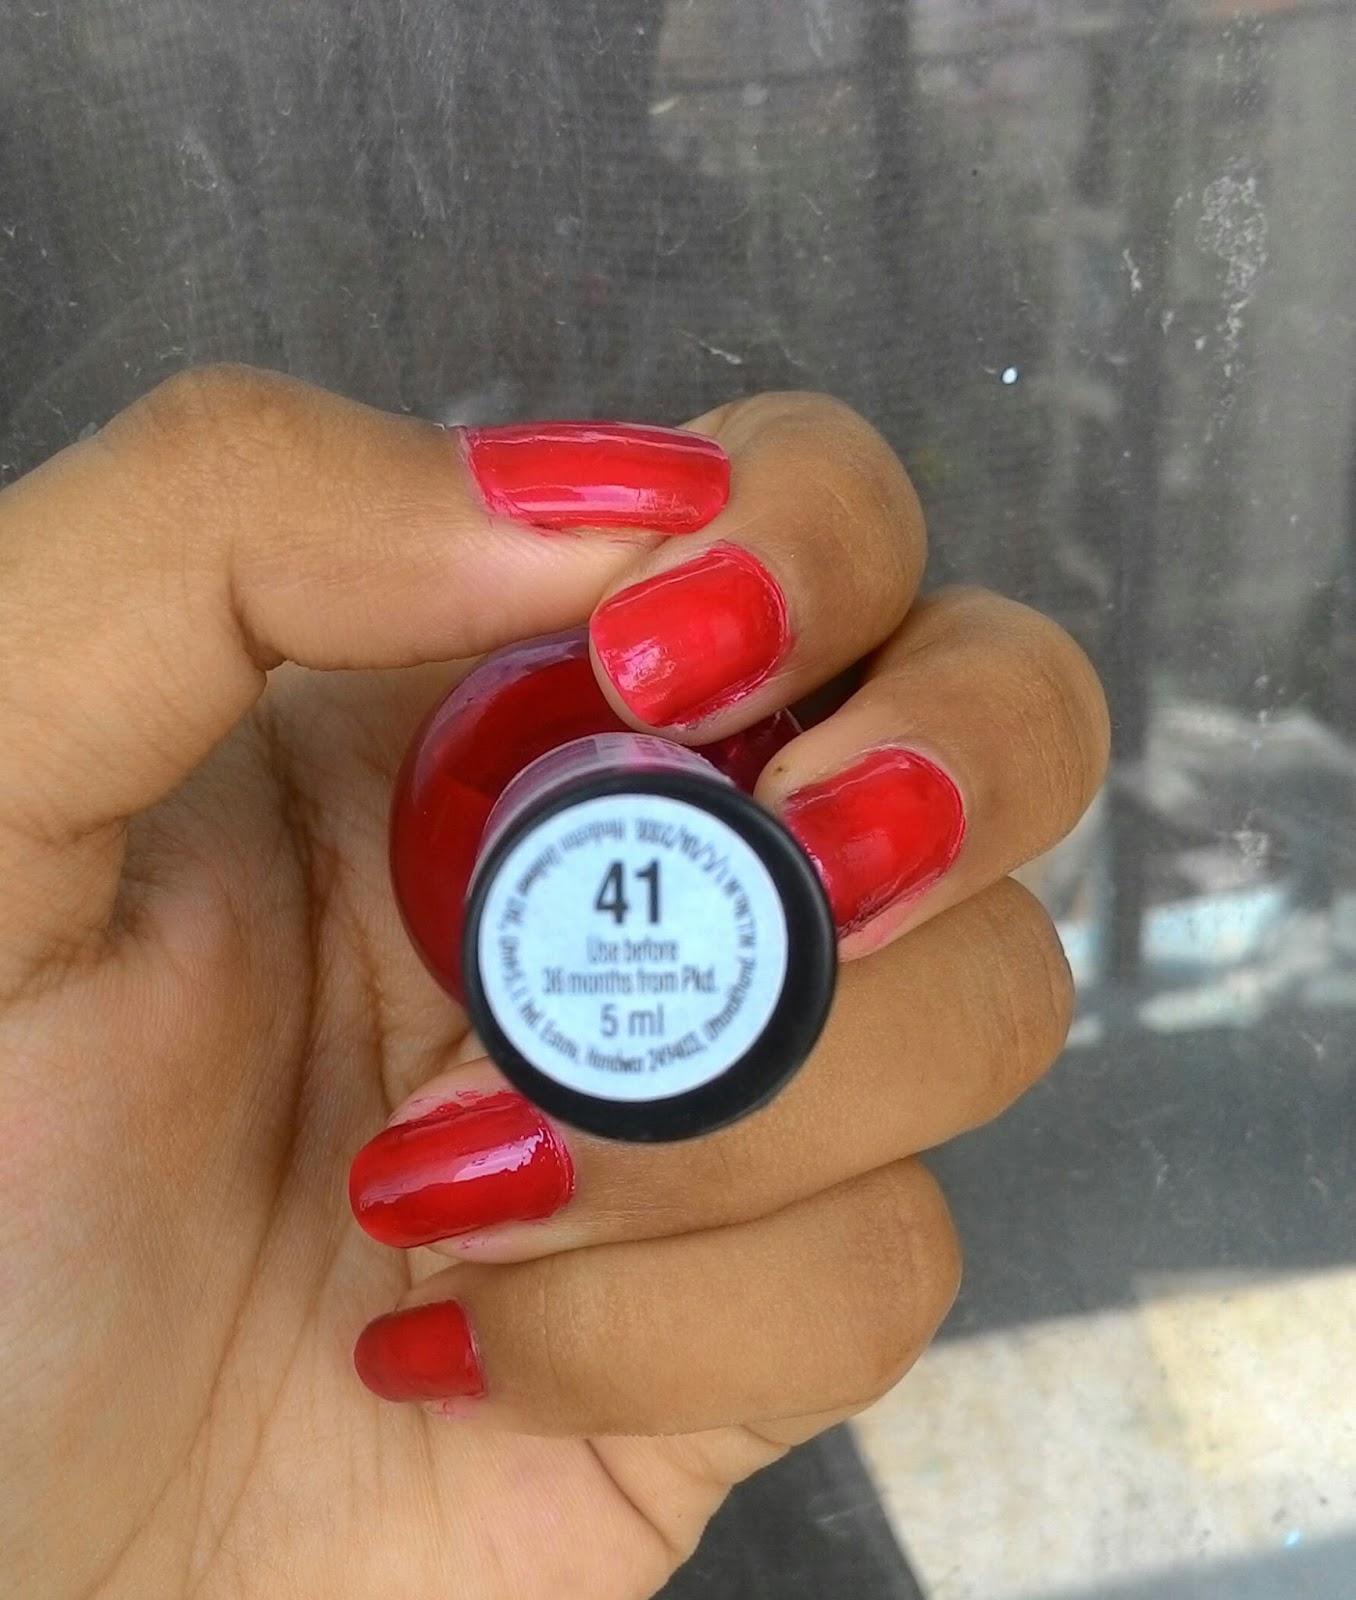 Elle 18 Nail Pops Shade 41 - Review | The Beautyholic | Beauty ...